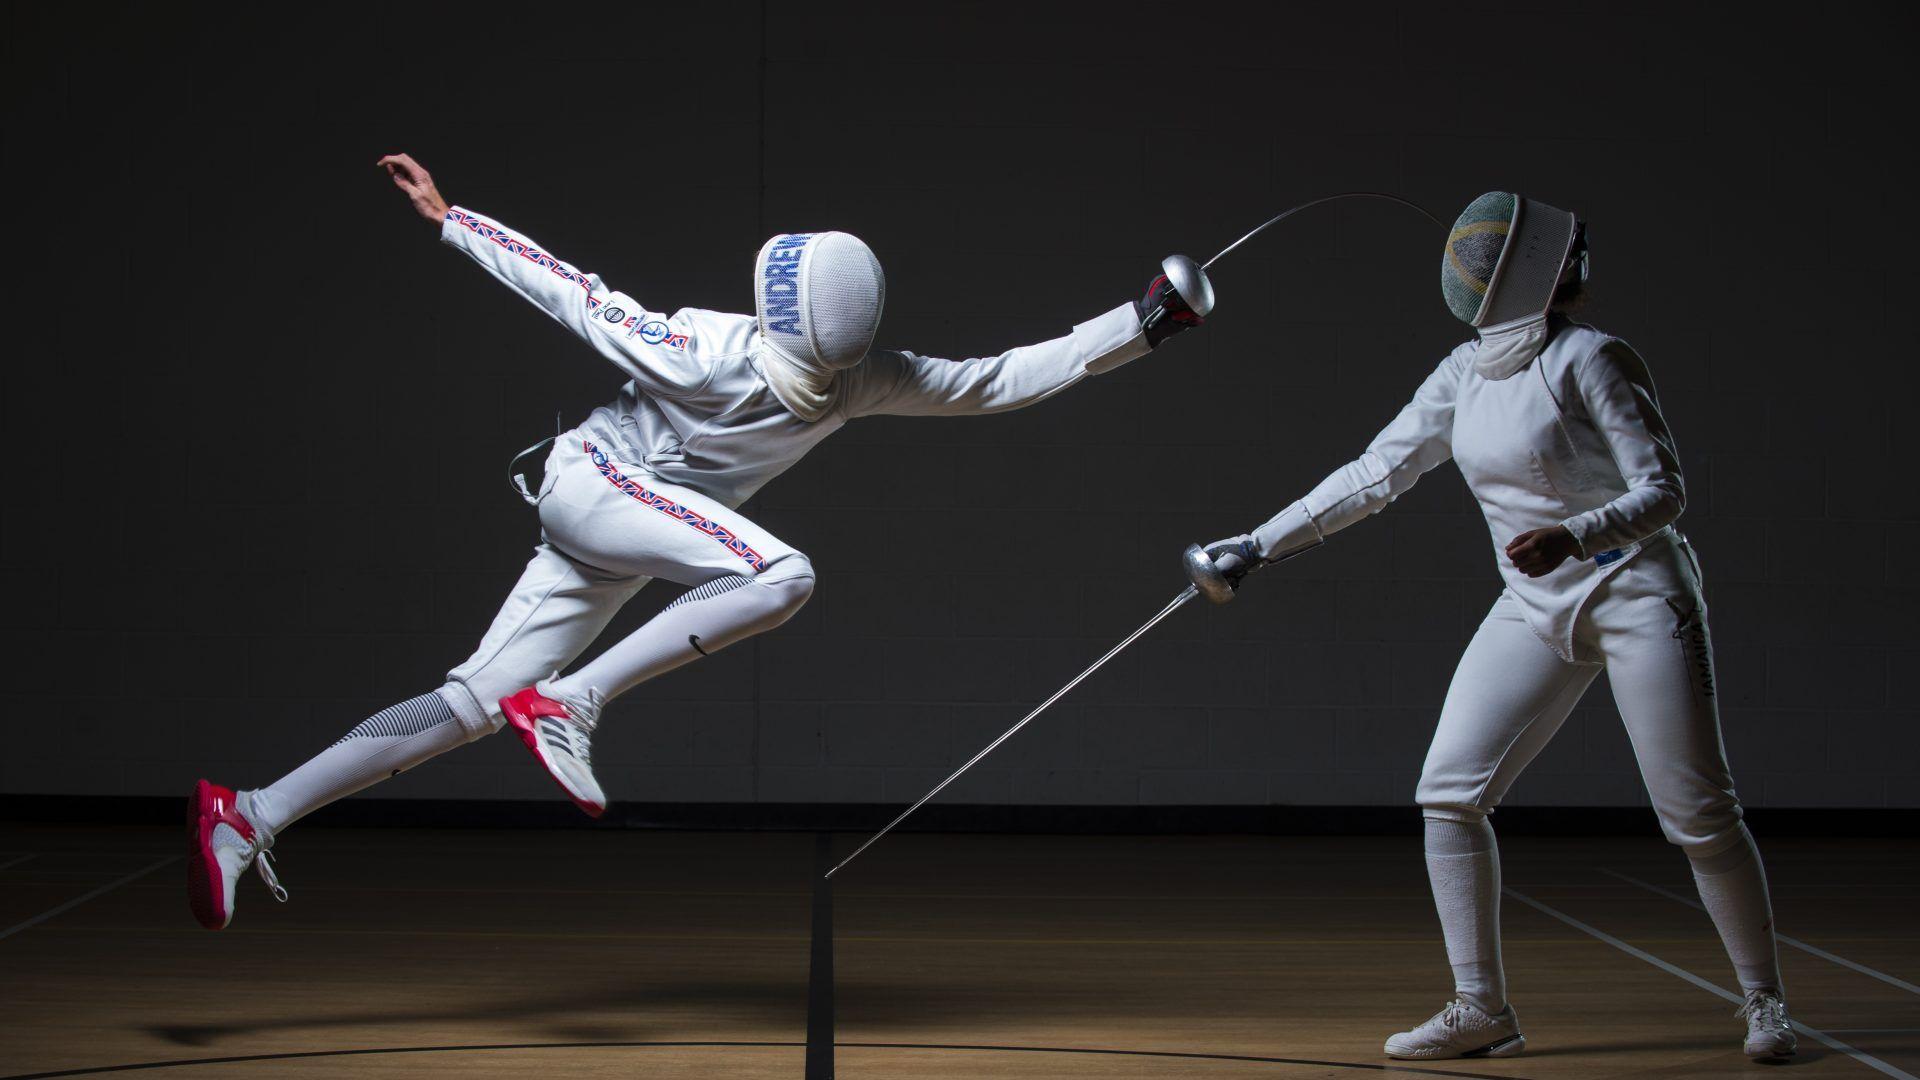 Fencing wallpaper for laptop